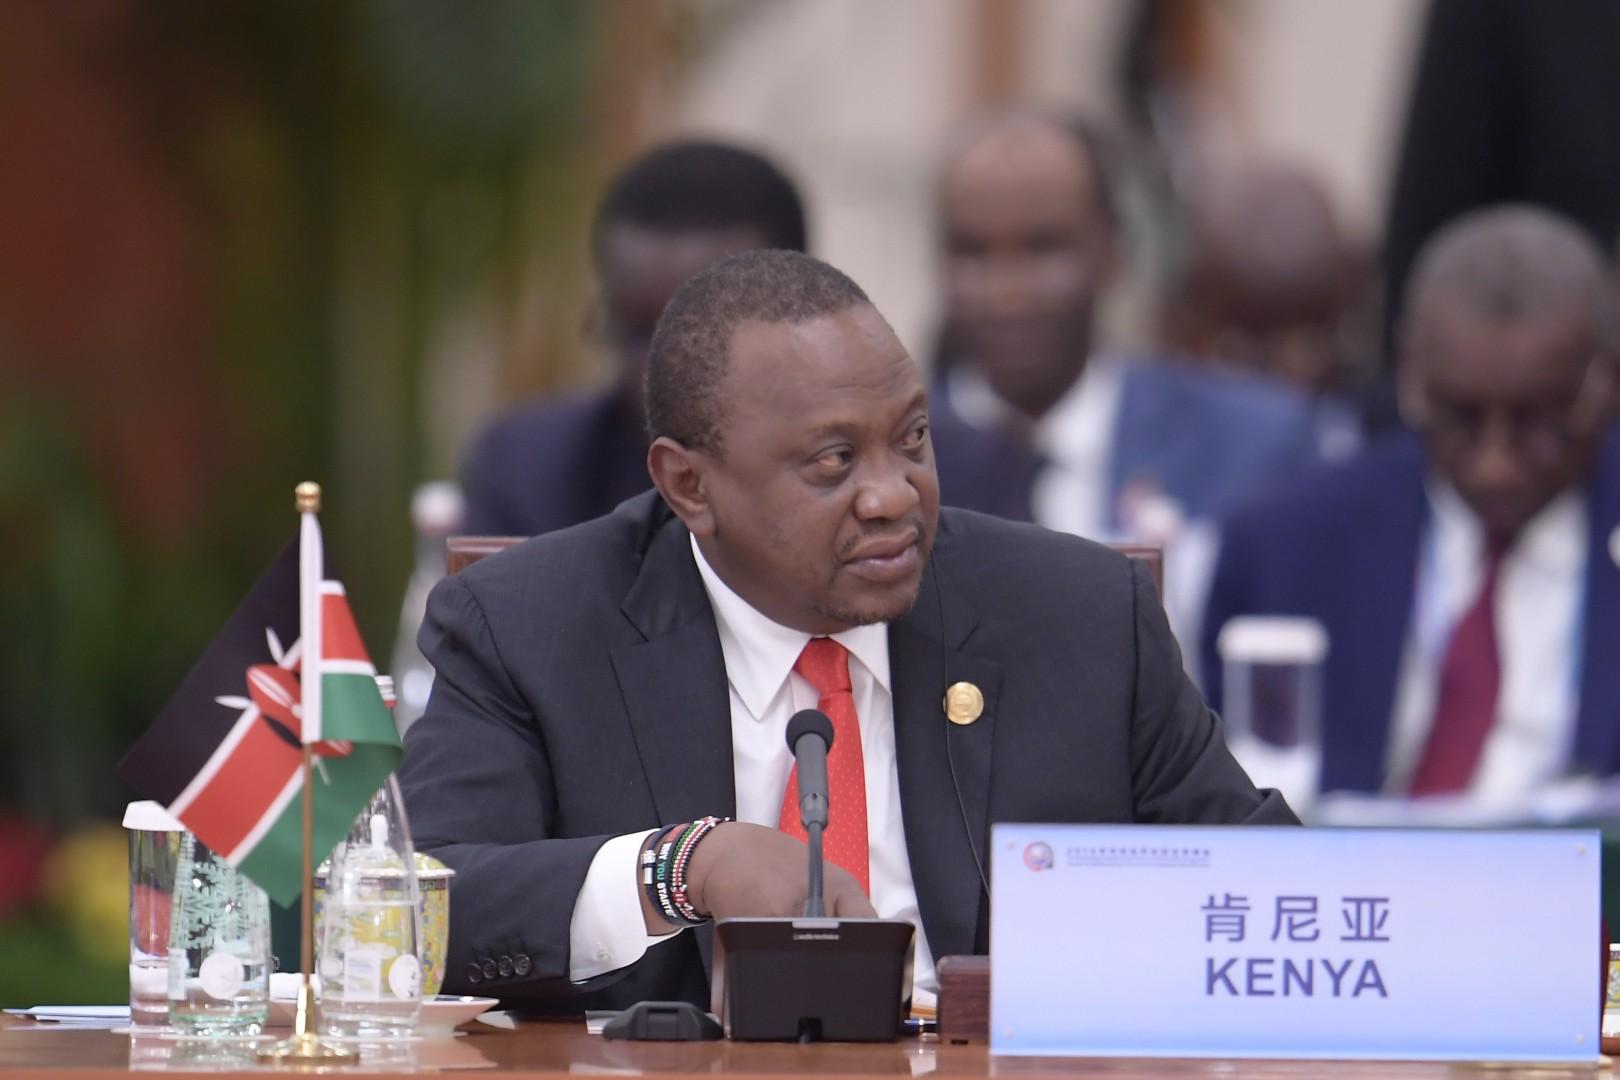 Chinese businessman arrested after describing Kenyans, including the